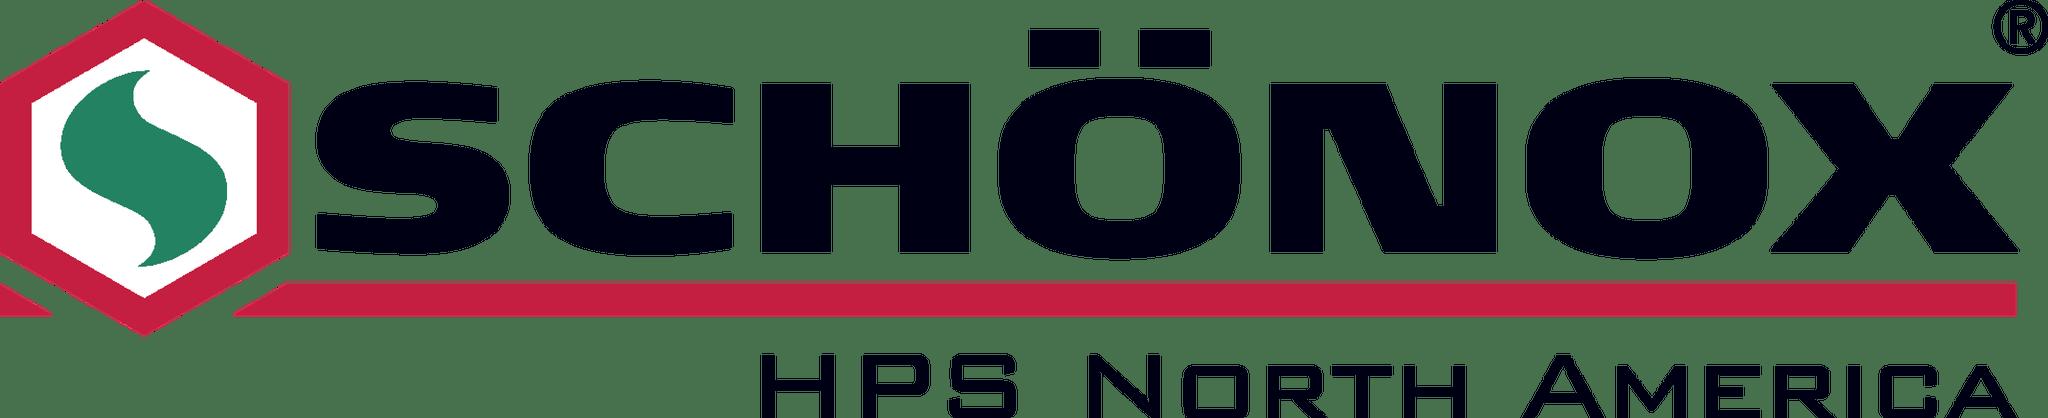 Schönox HPS North America, Inc.